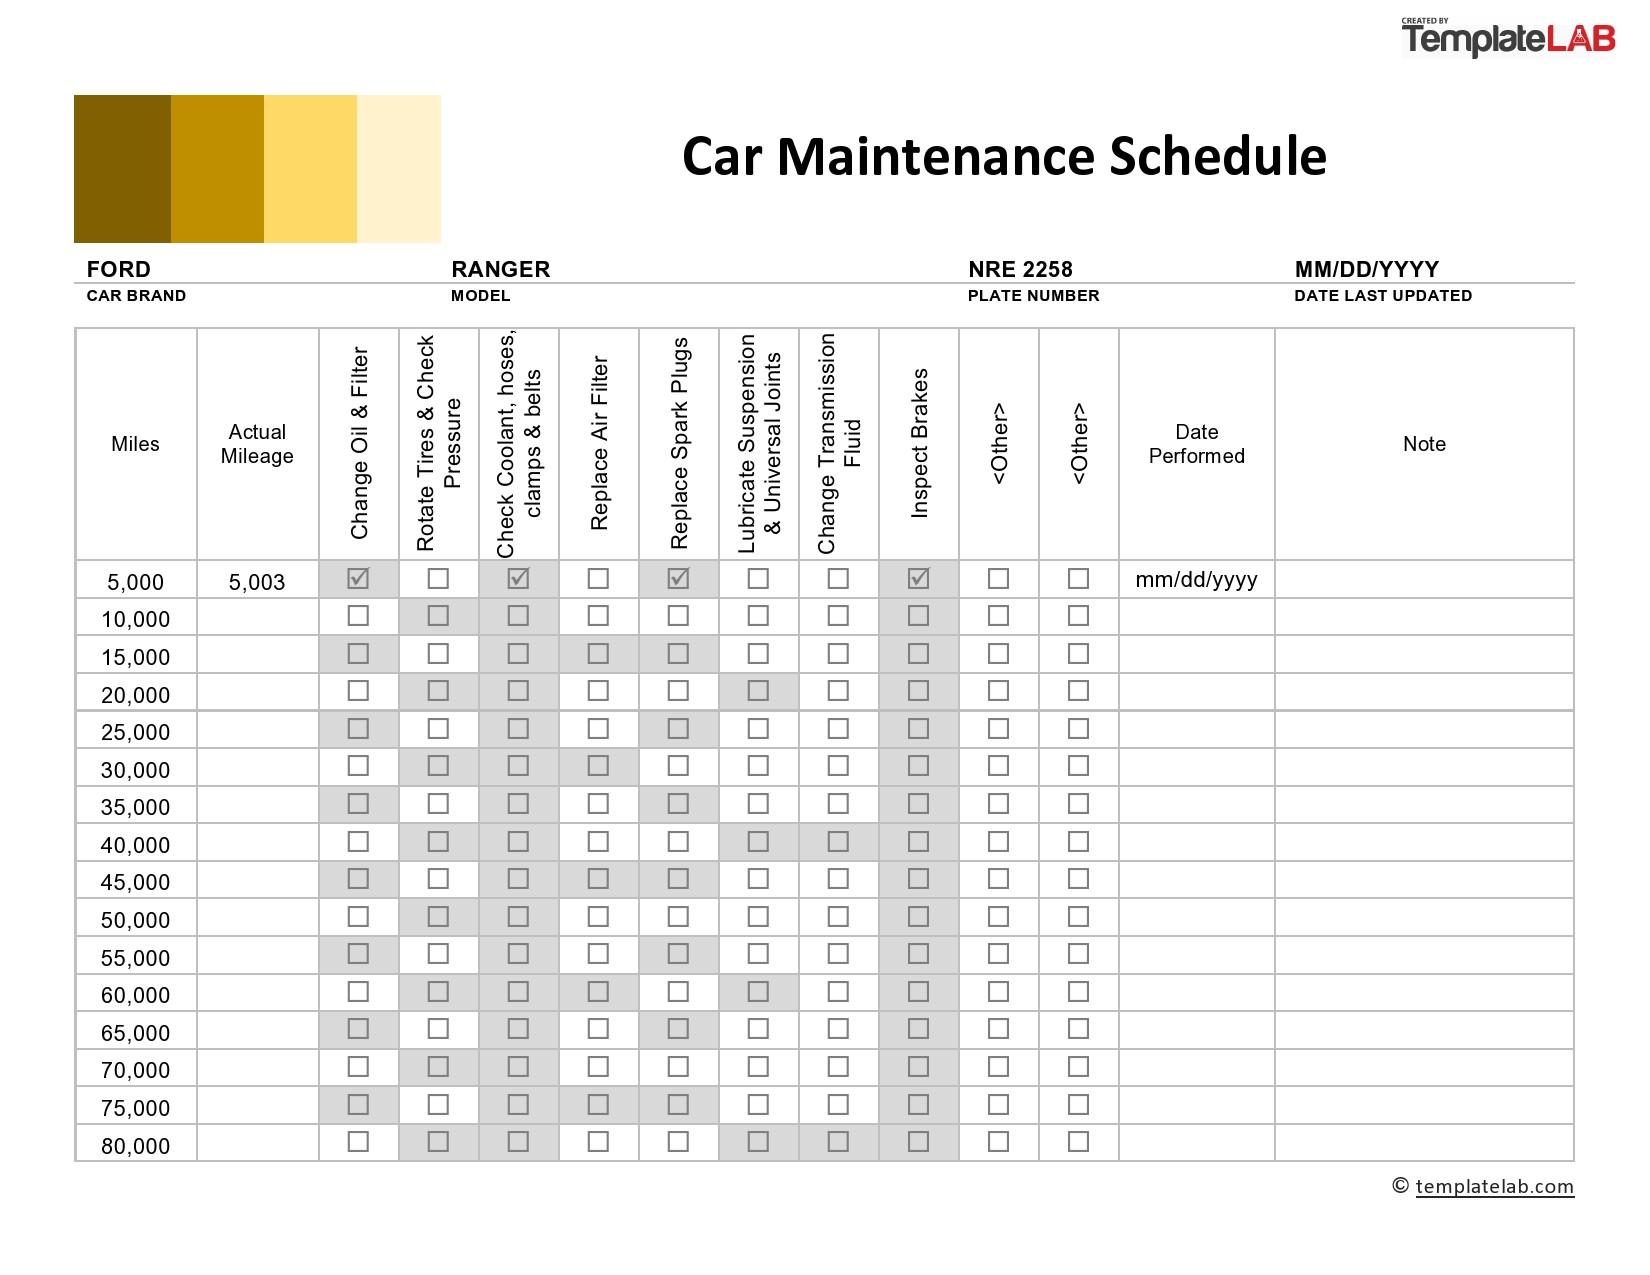 43 Printable Vehicle Maintenance Log Templates ᐅ TemplateLab